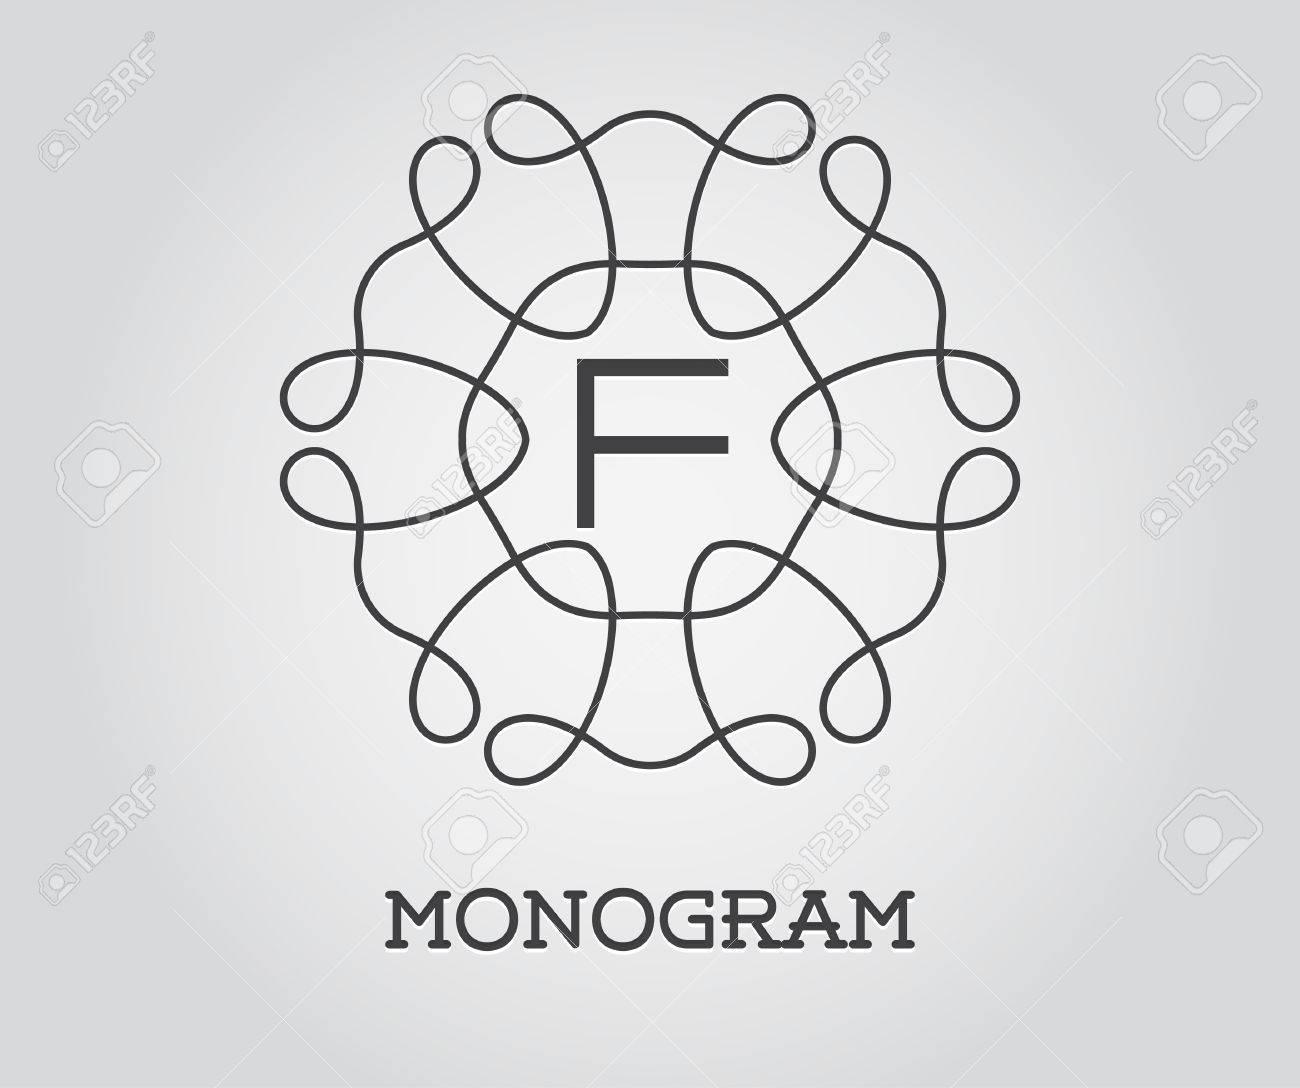 monogram design template with letter f illustration premium elegant quality stock vector 50185631